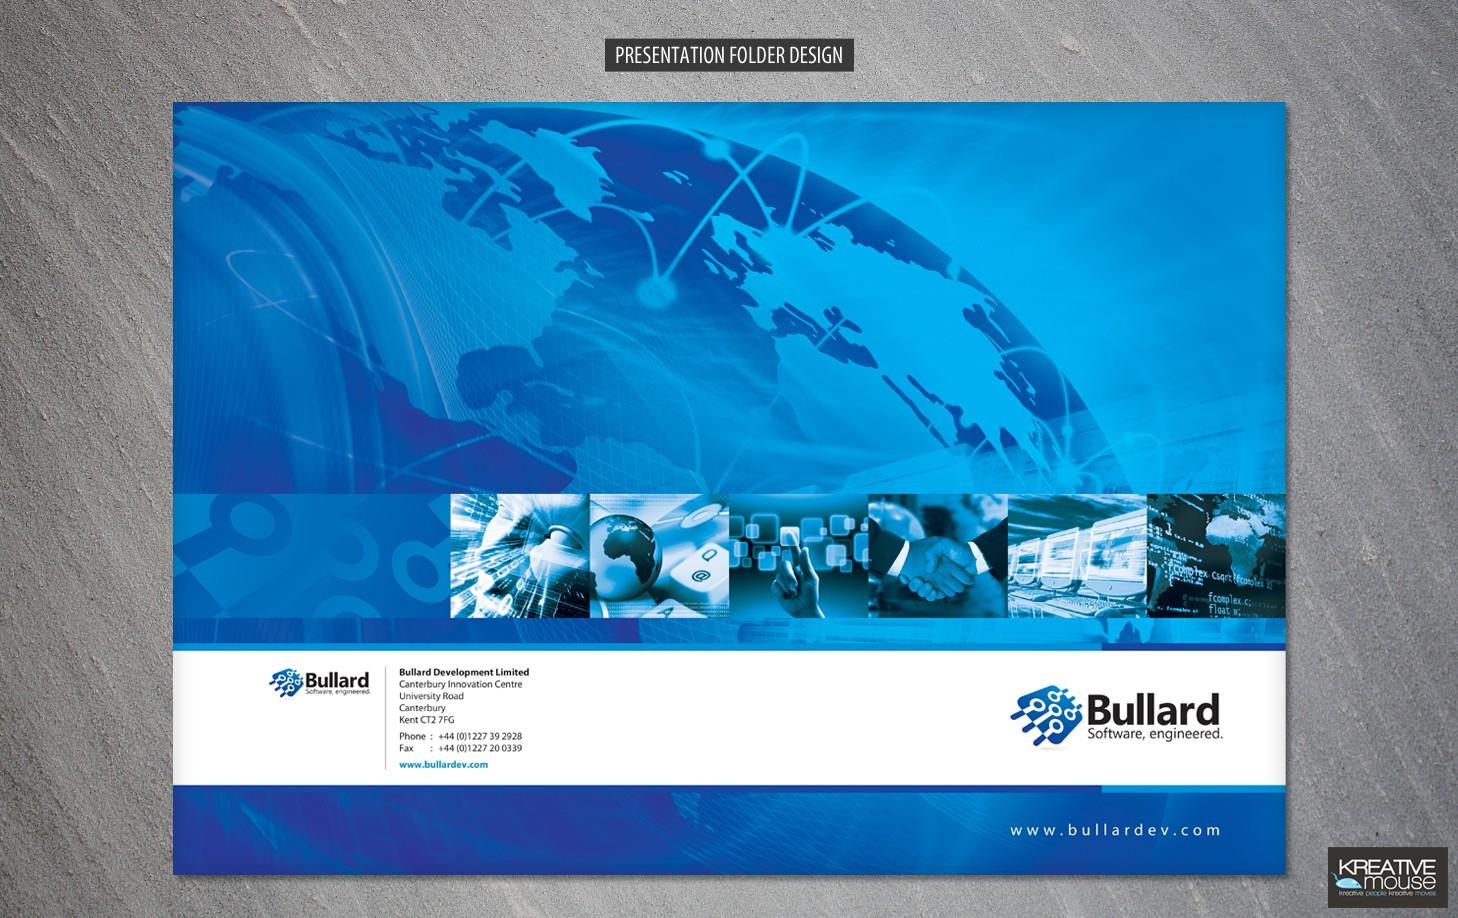 New Presentation Folder design wanted for Bullard Development Limited